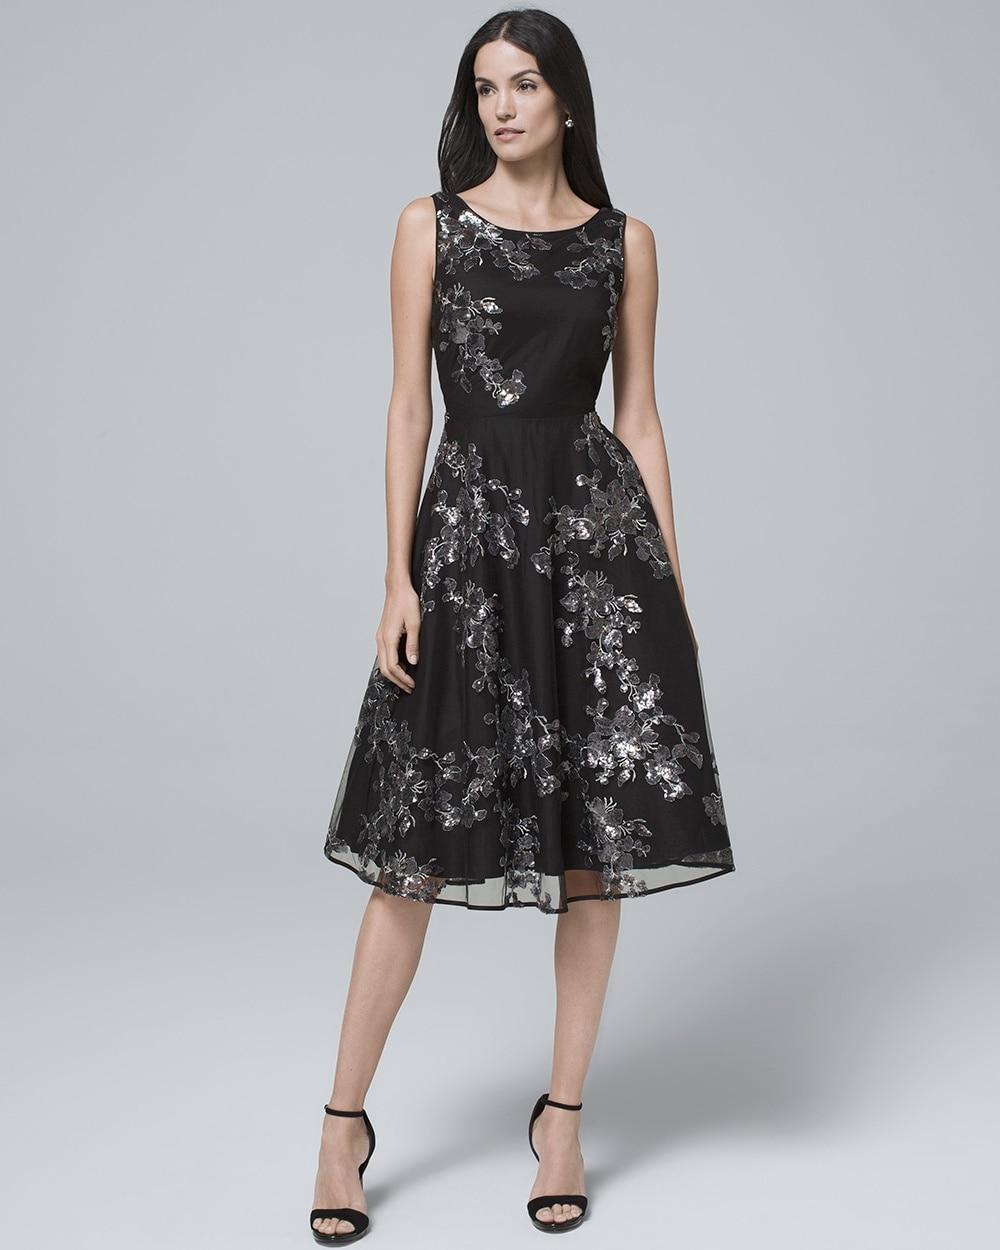 Black Cocktail Dress Shop